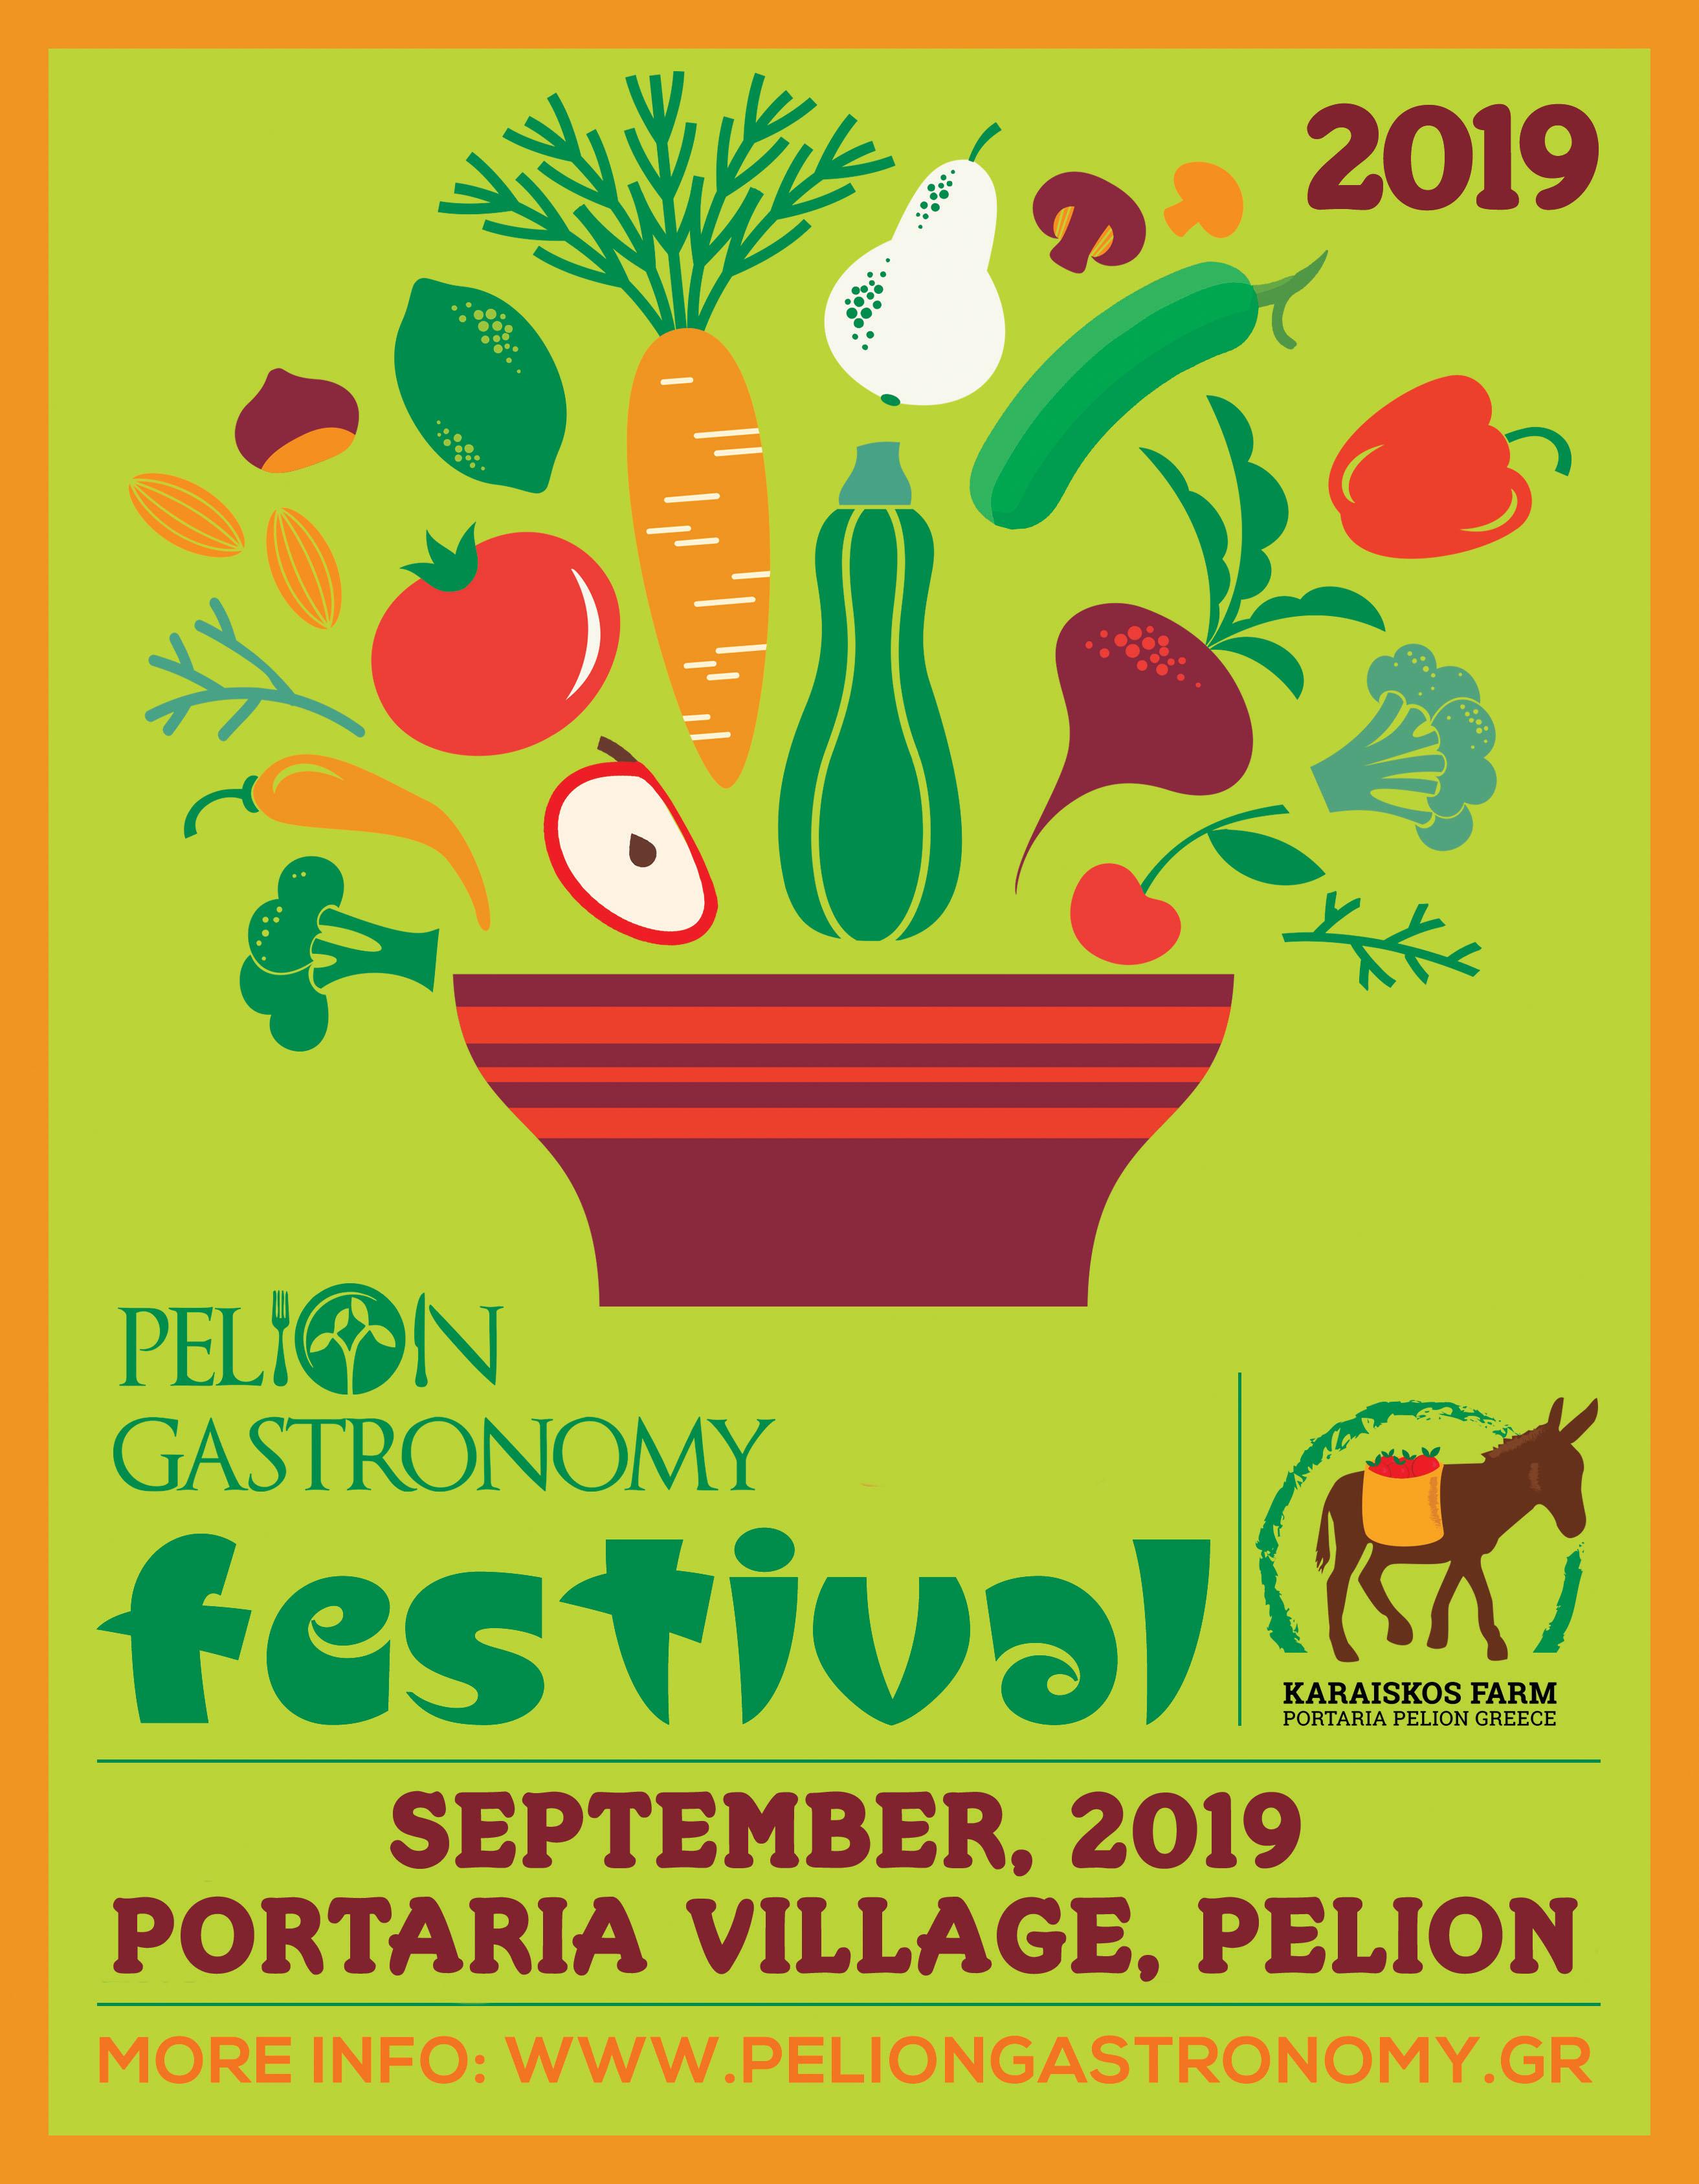 pelion festival final poster